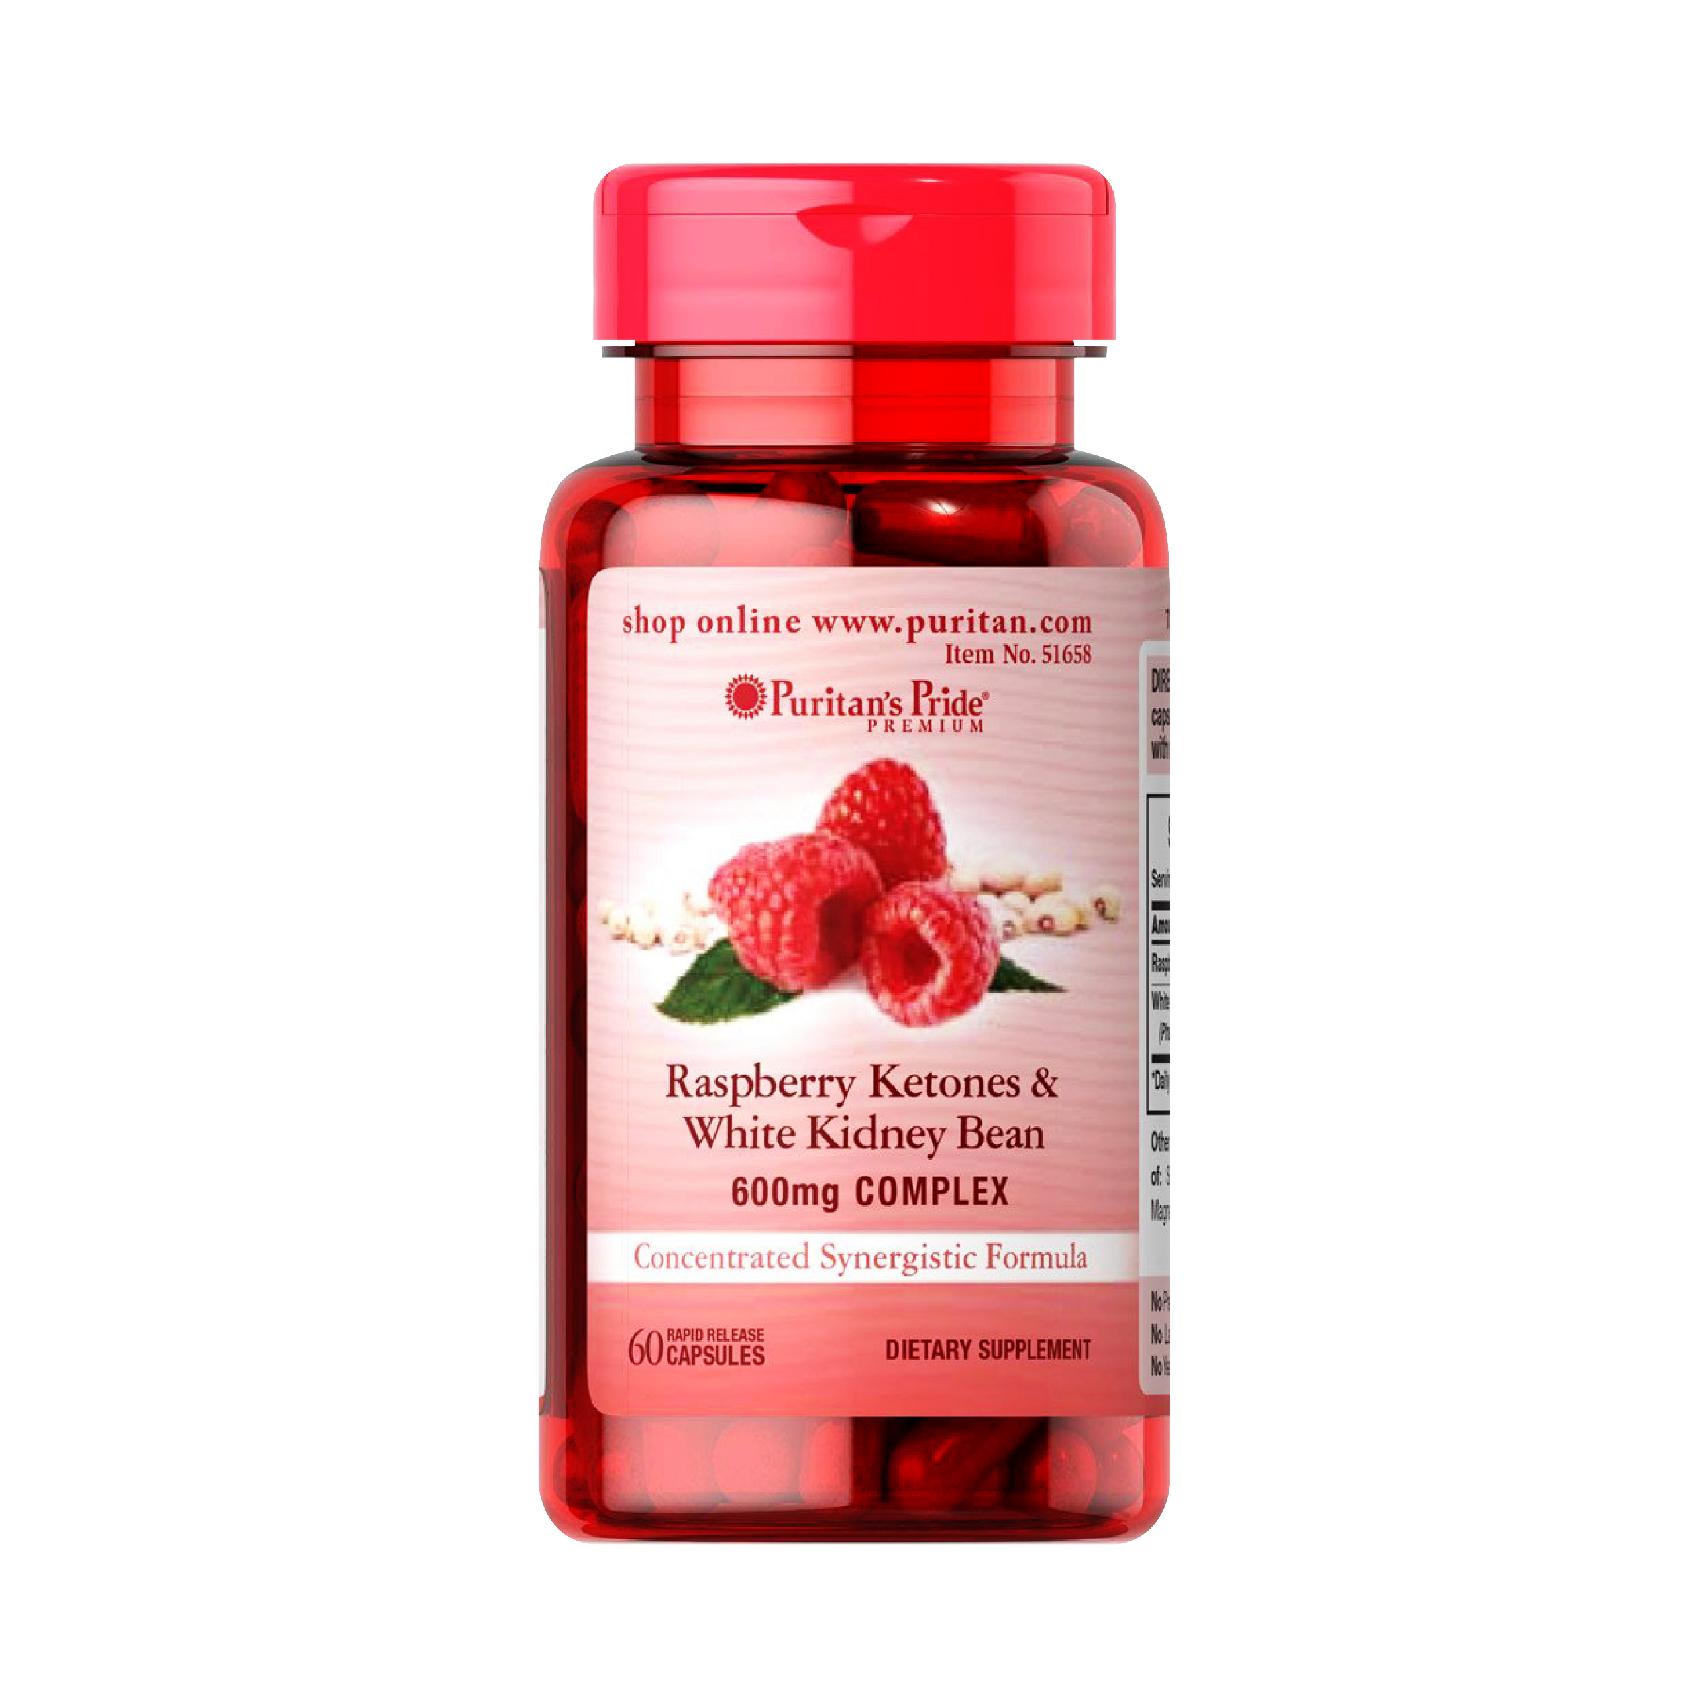 Viên uống hỗ trợ giảm cân Puritan's Pride Raspberry Ketones & White Kidney Bean 600mg Complex 60 viên